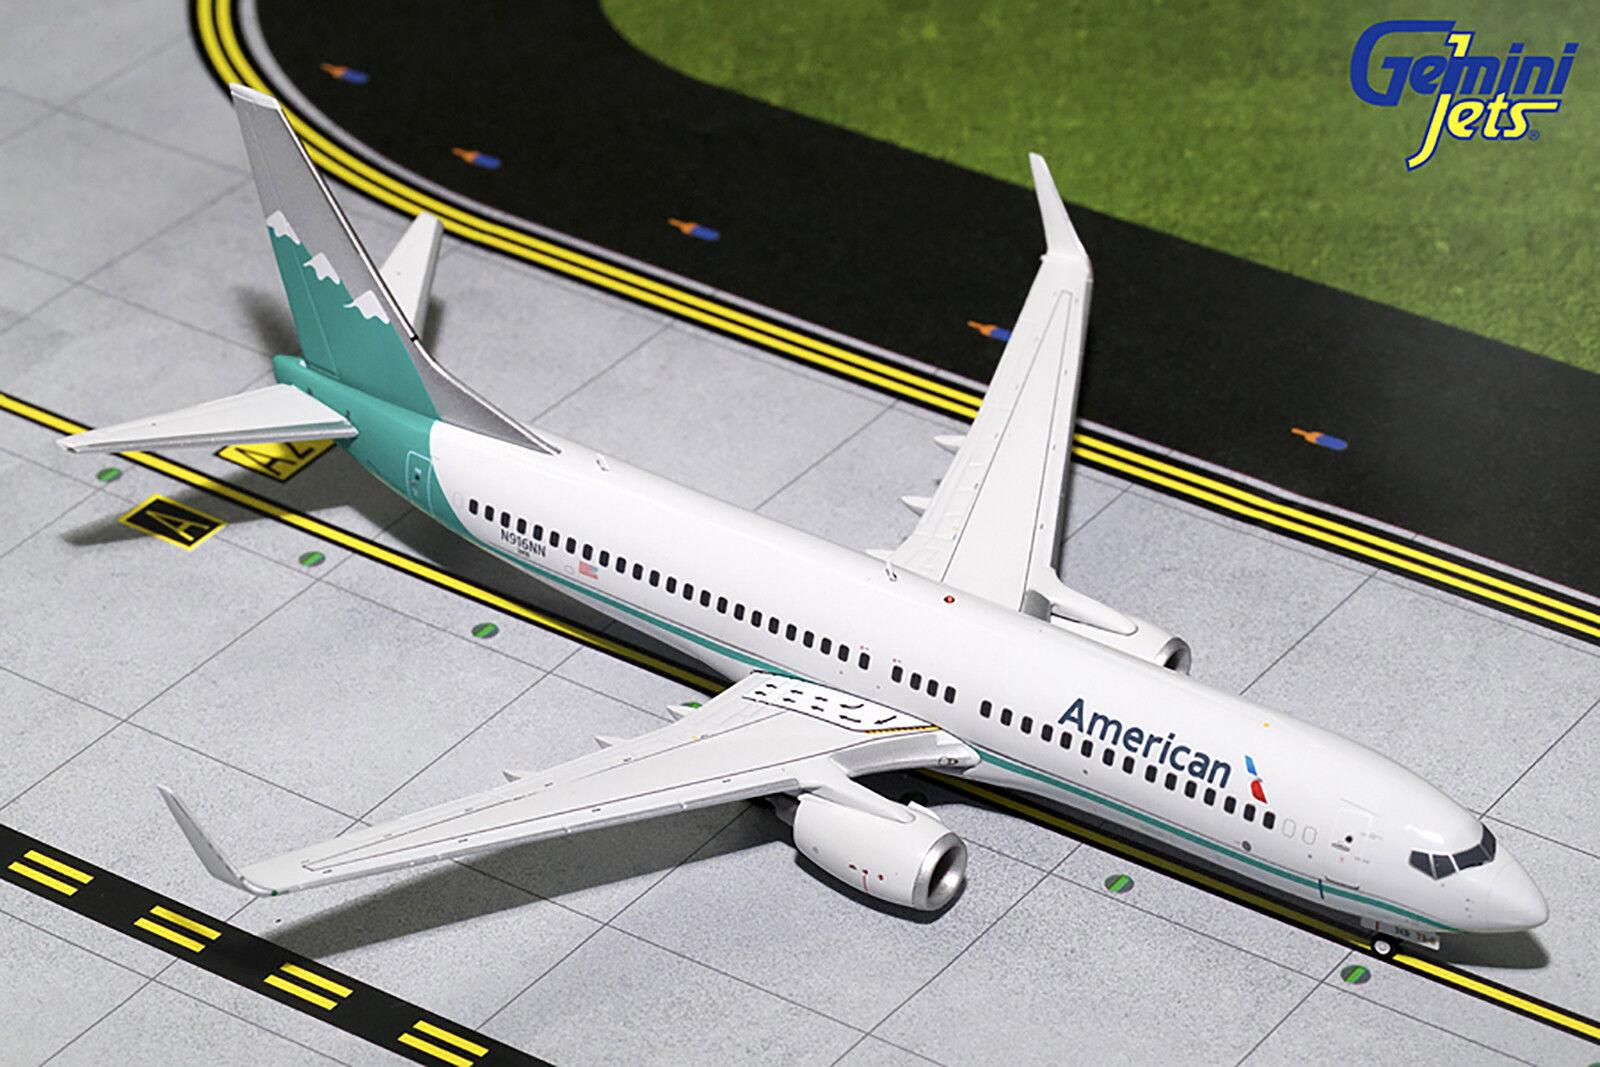 Gemini200 amerikanische boeing 737 - 800 g2aal703 1   200, reg   n916nn.neue